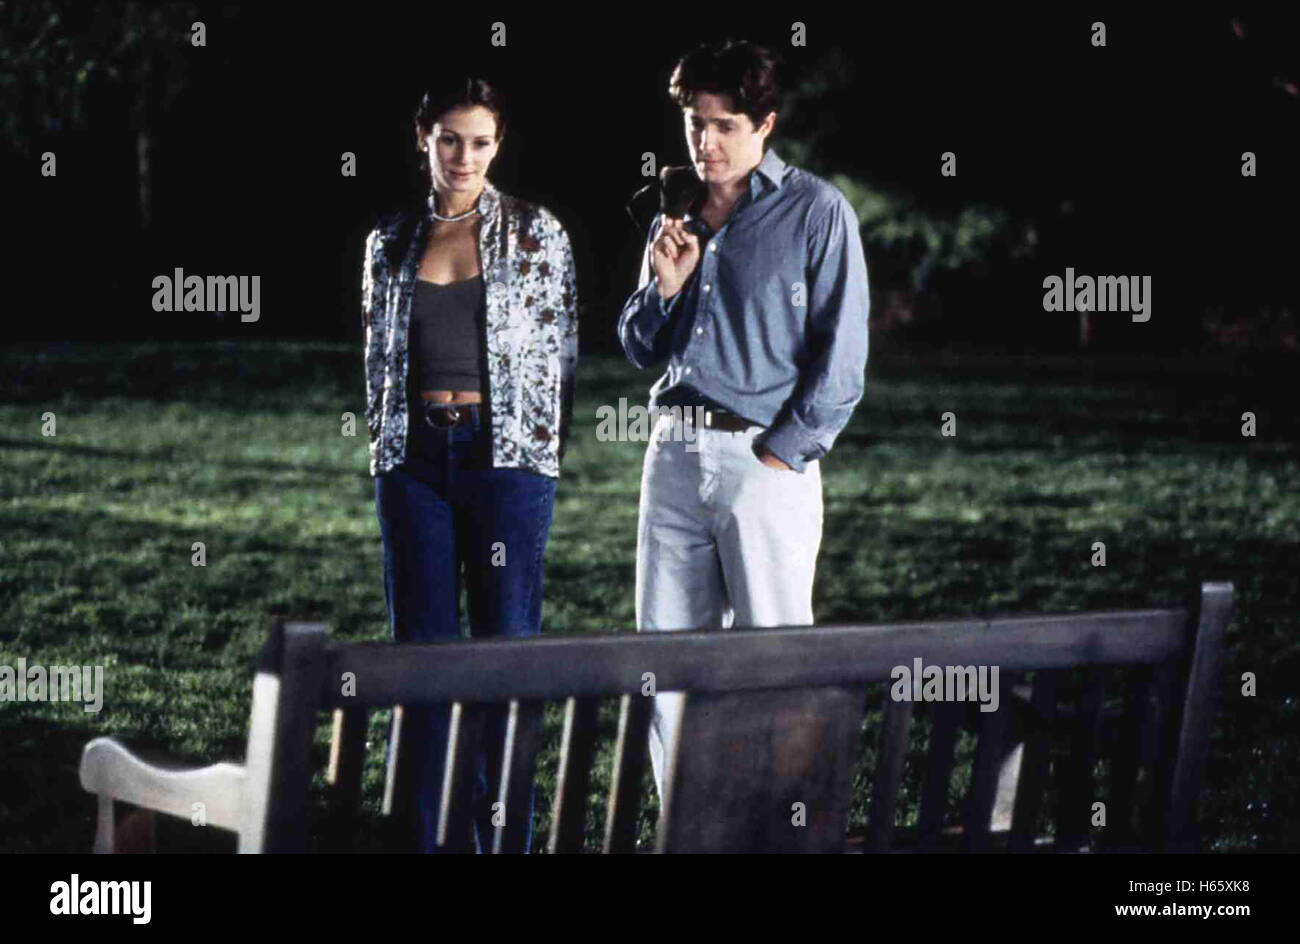 Notting Hill (1999), Director: Roger Michell, Actors/Stars: Hugh Grant, Julia Roberts, Richard McCabe - Stock Image